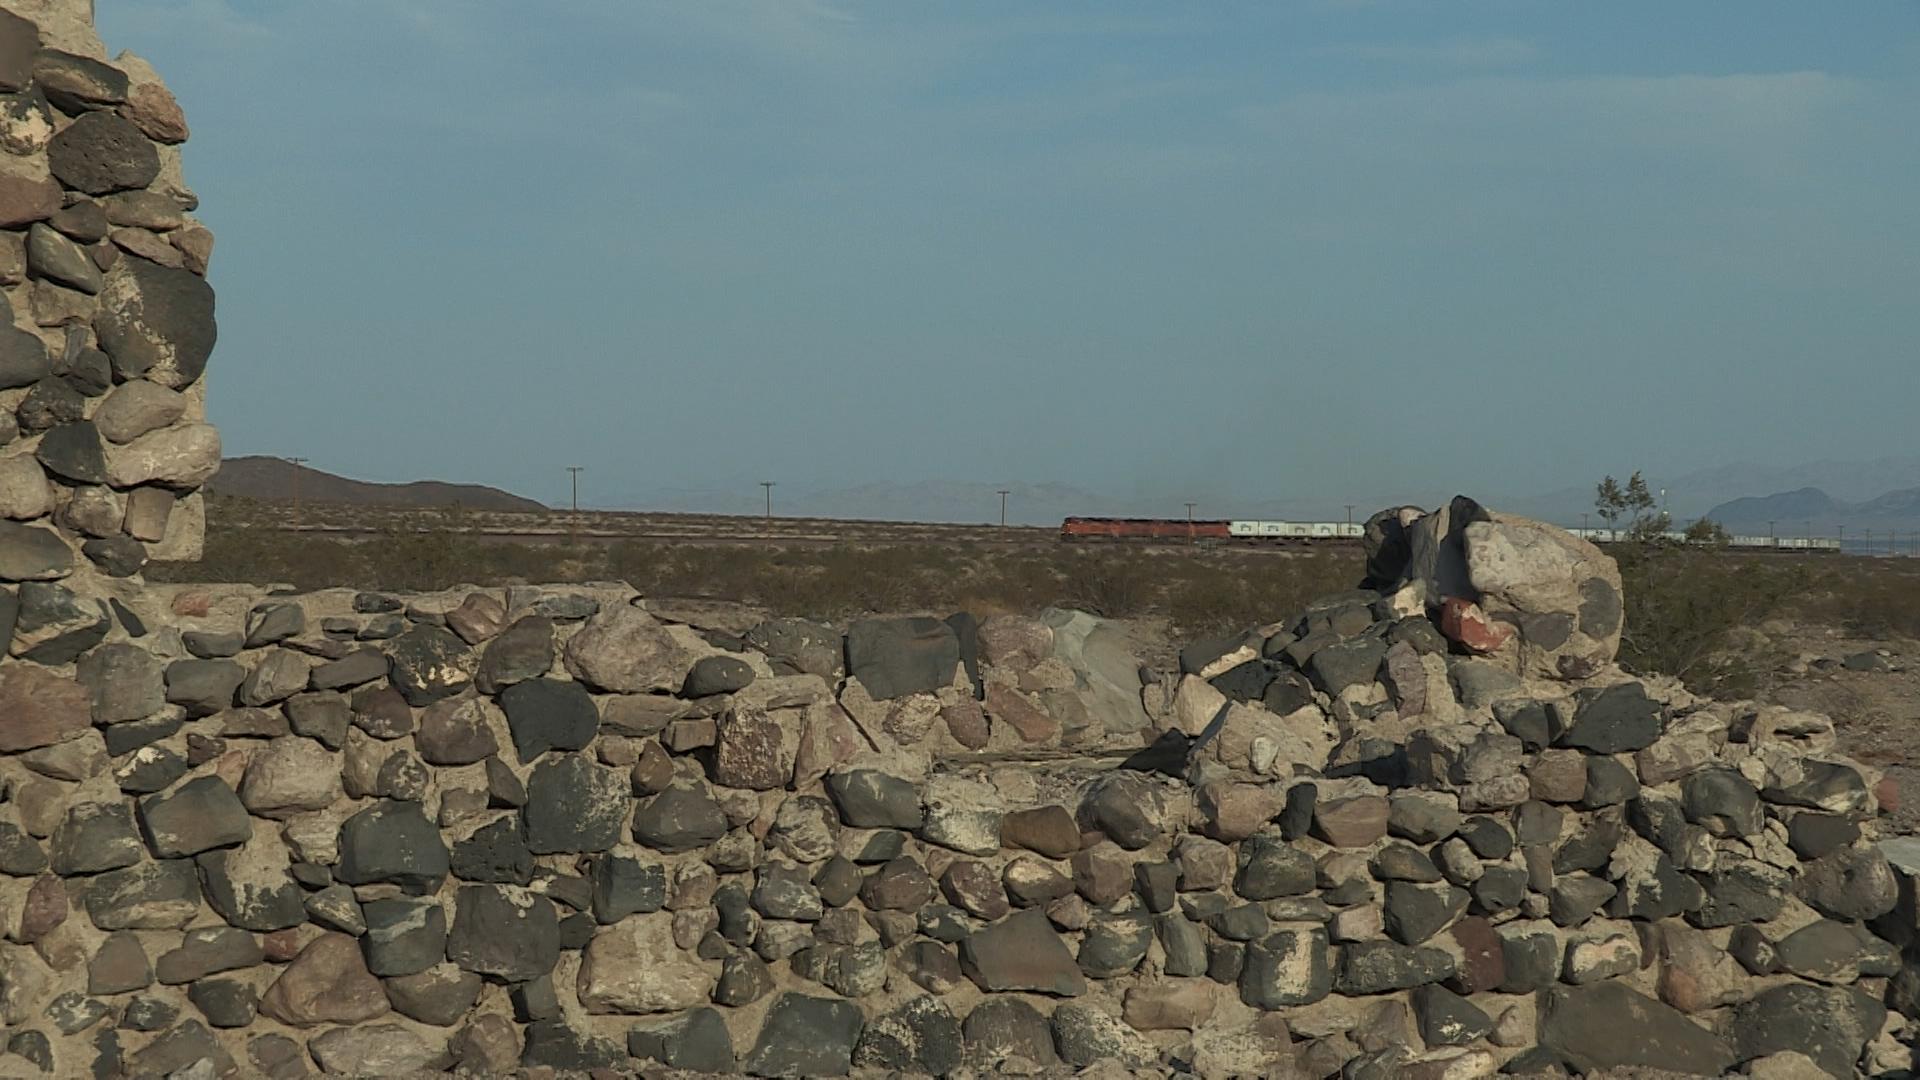 10-Siberia BNSF framed by ruins.jpg